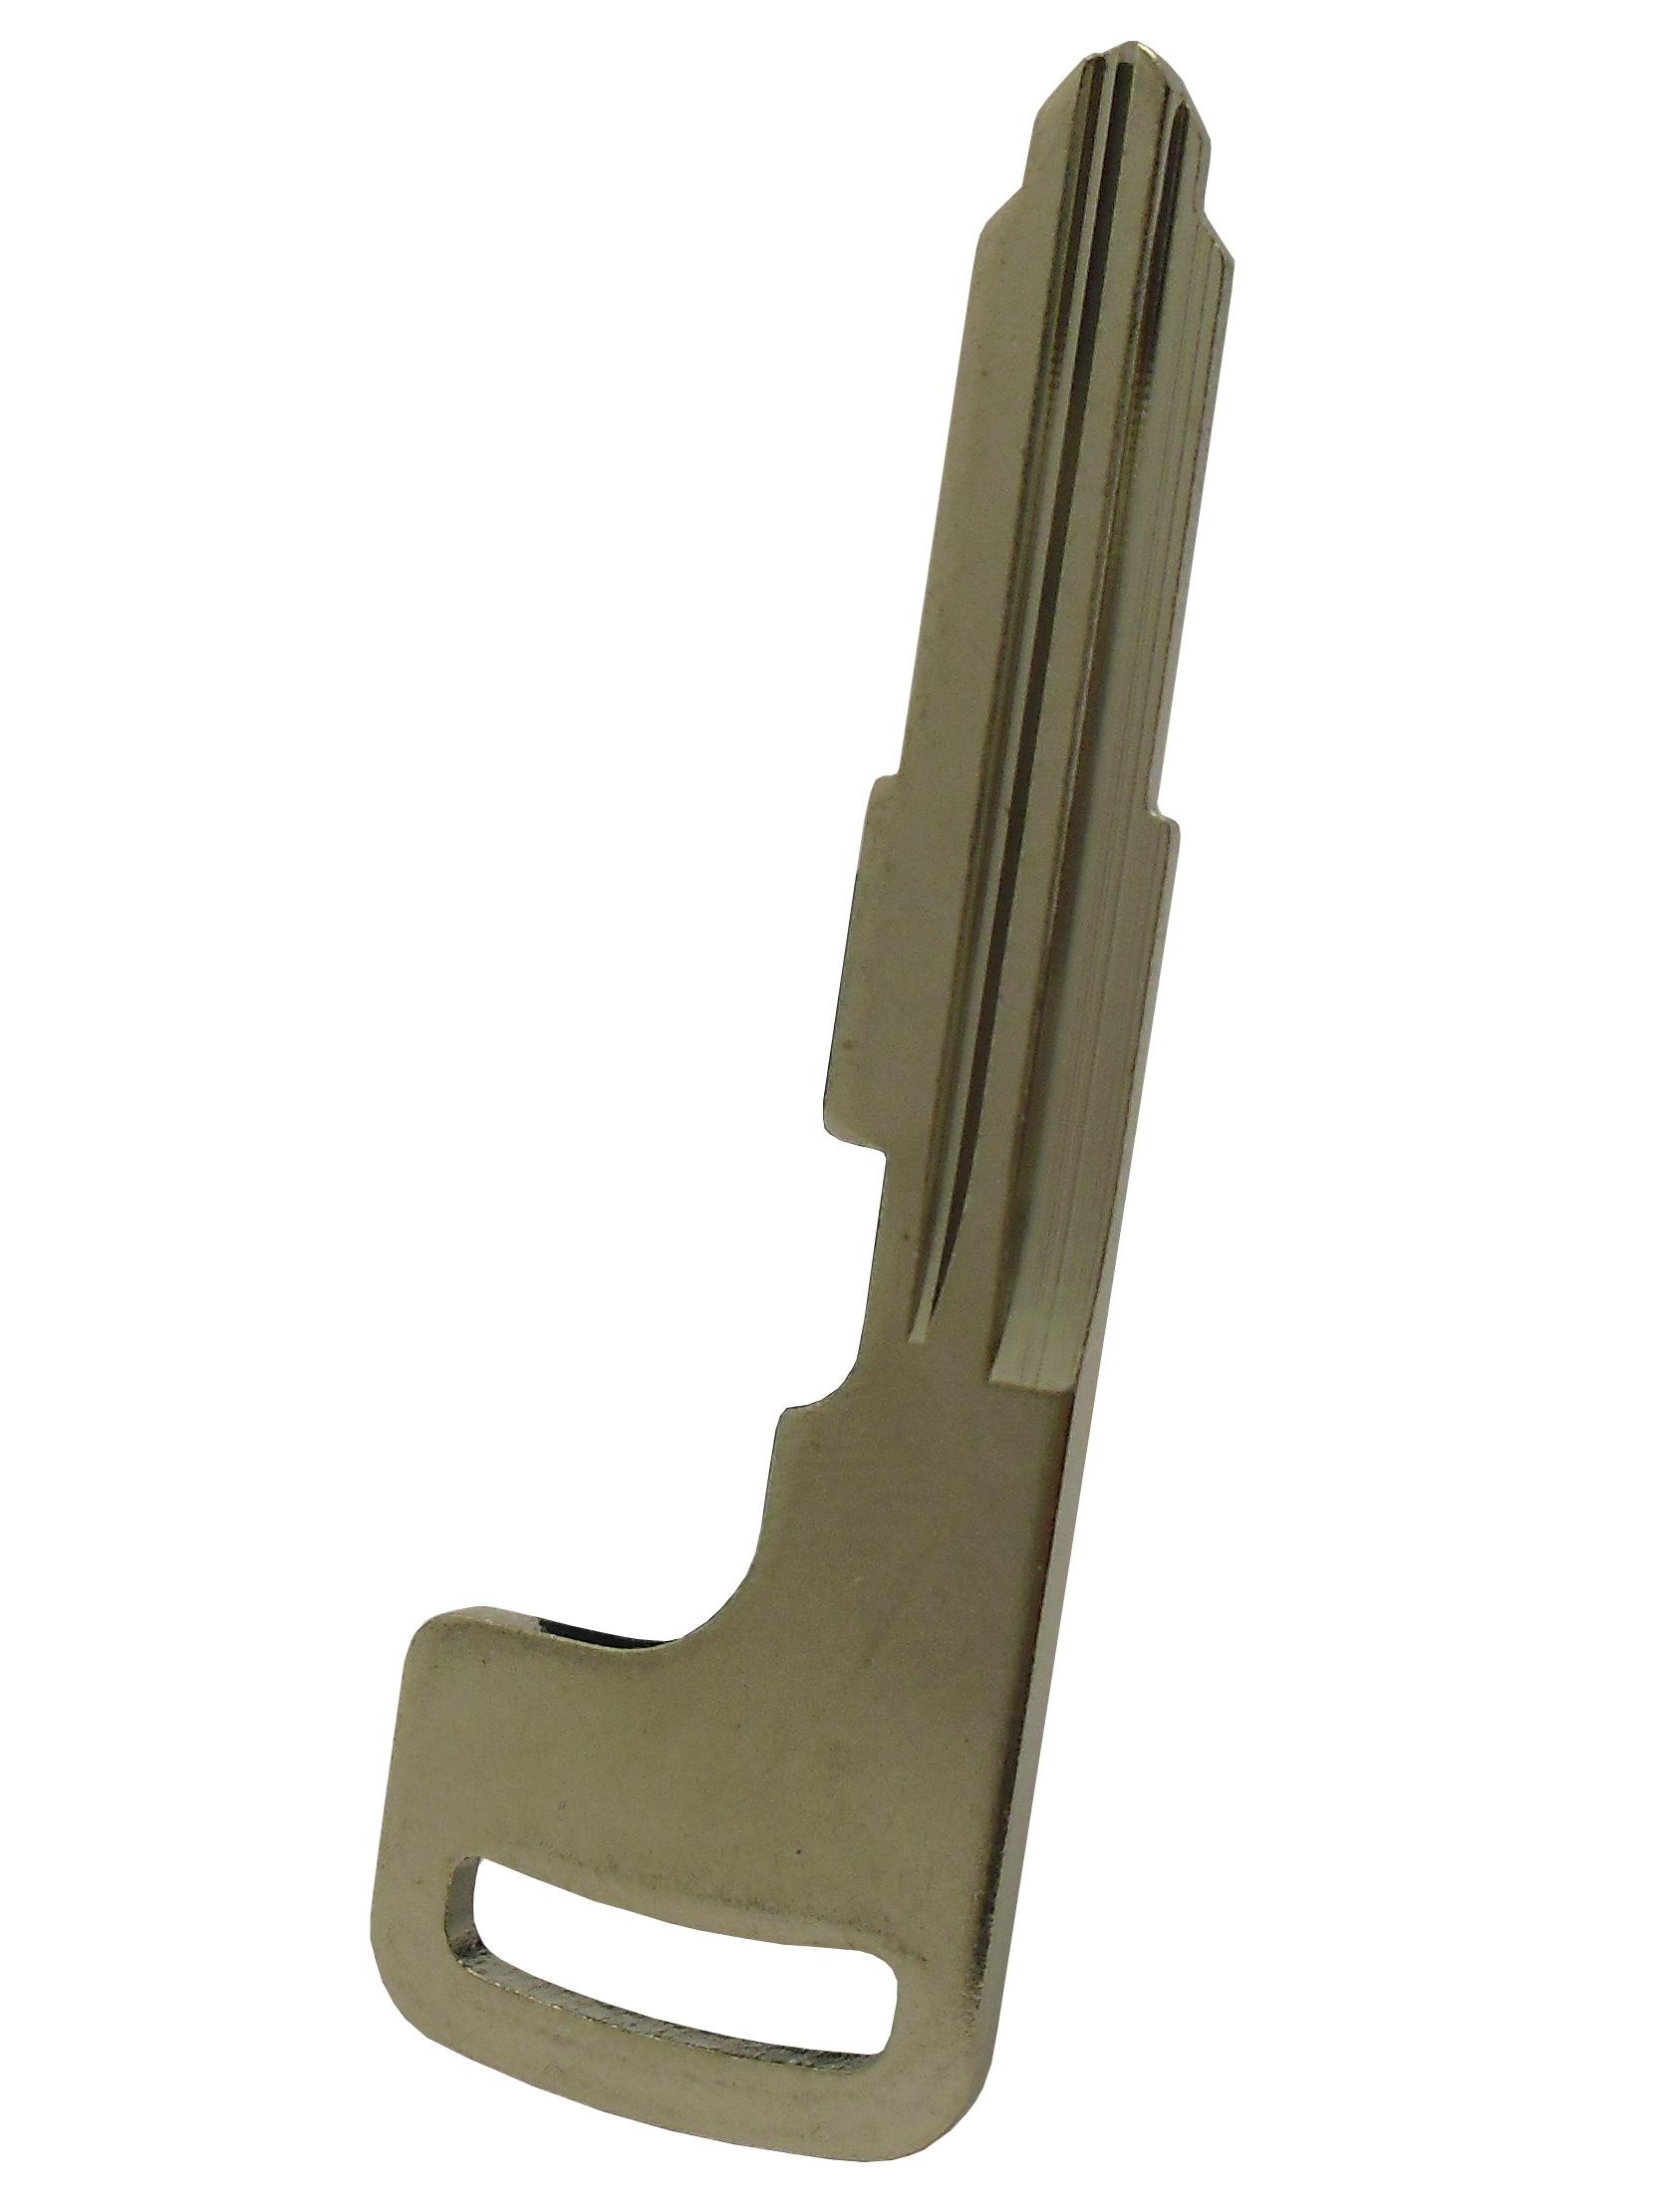 Mitsubishi Smart Key Insert Blade